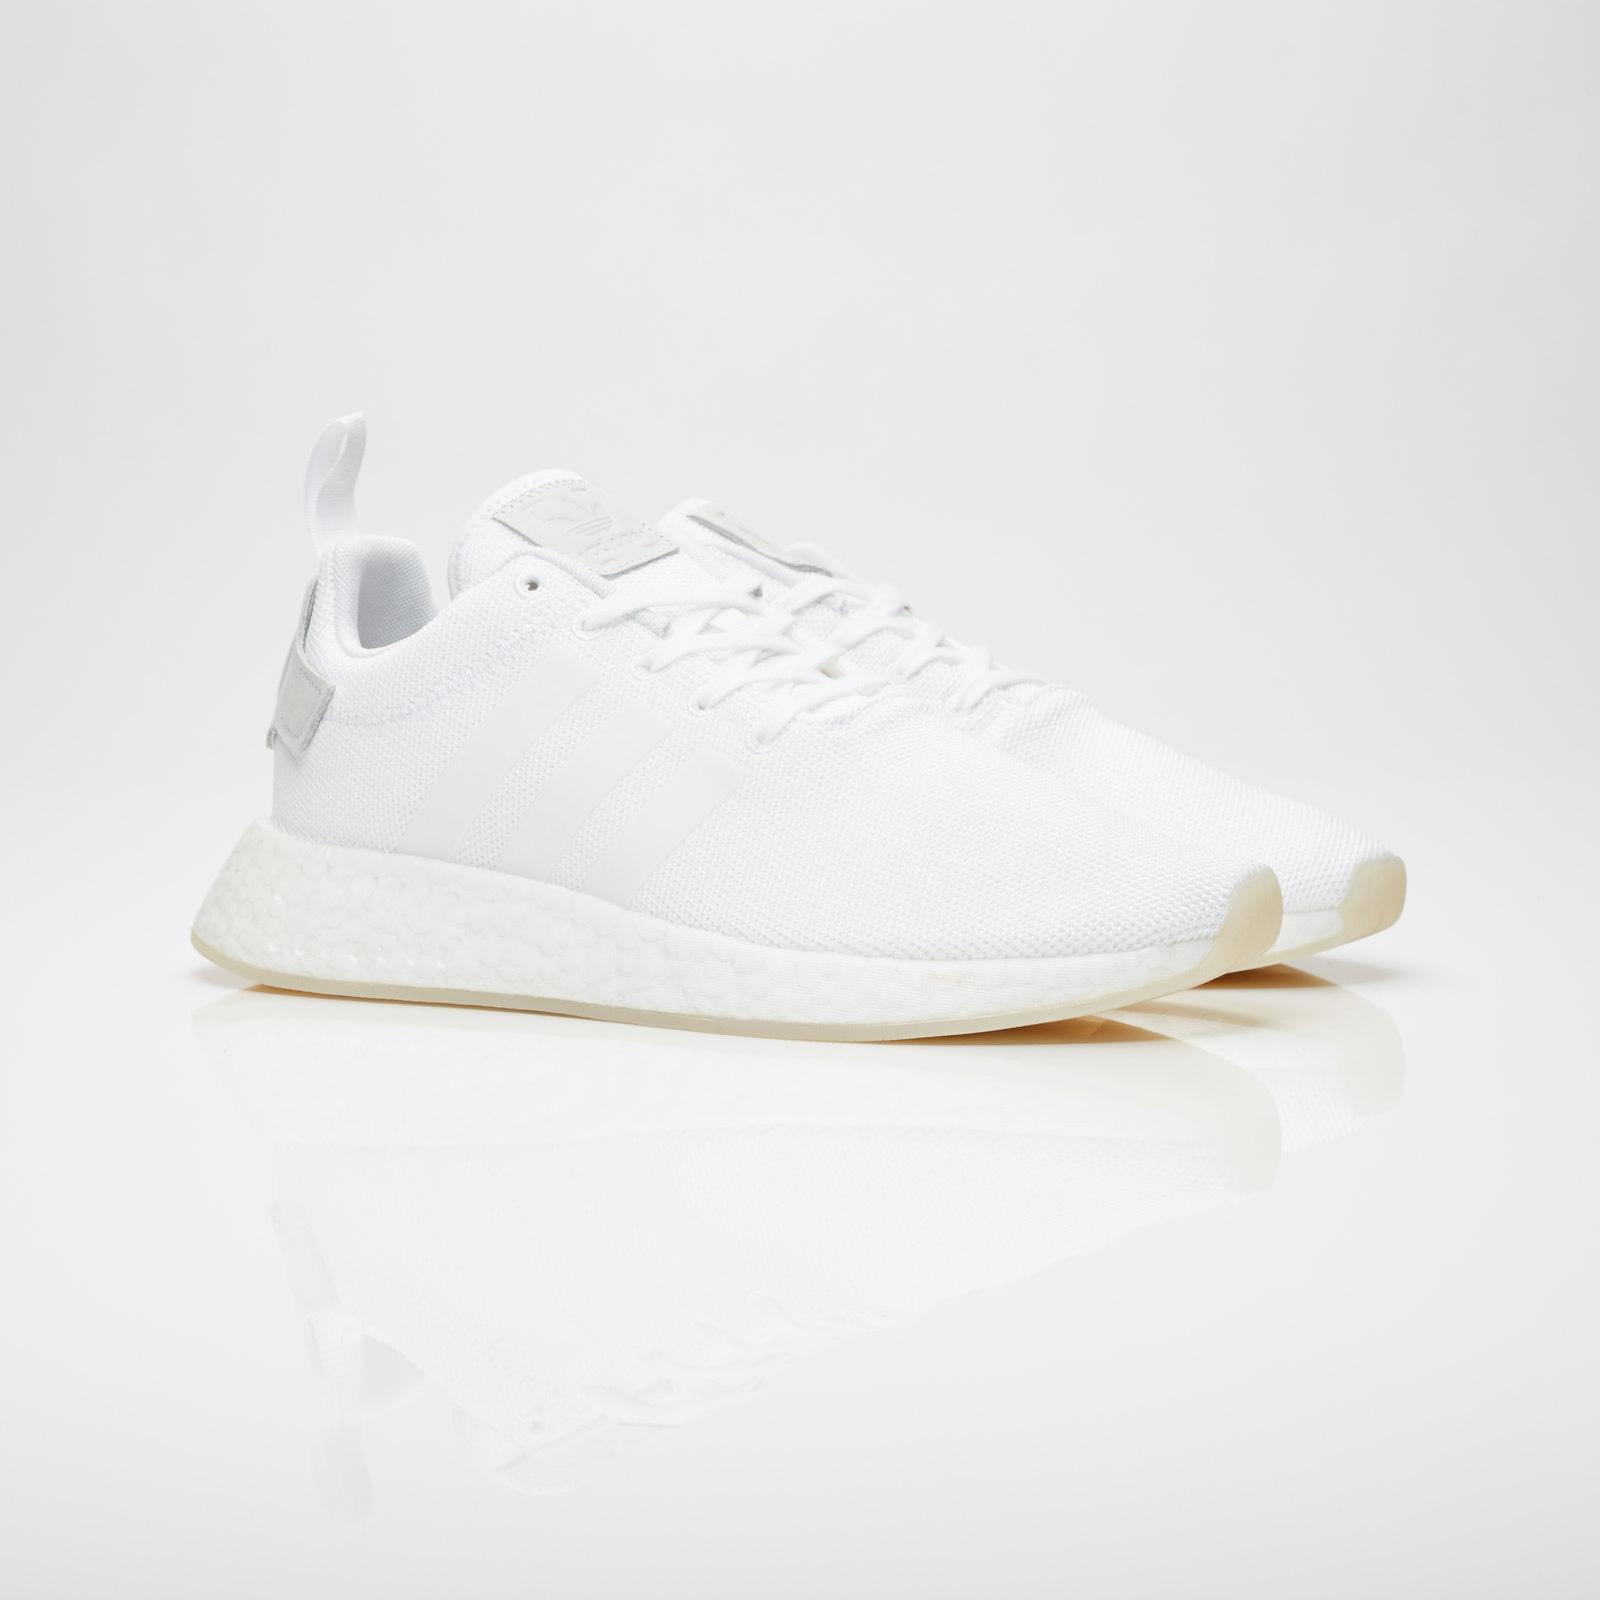 9bf38ddf8d054 adidas NMD R2 - Cq2401 - Sneakersnstuff